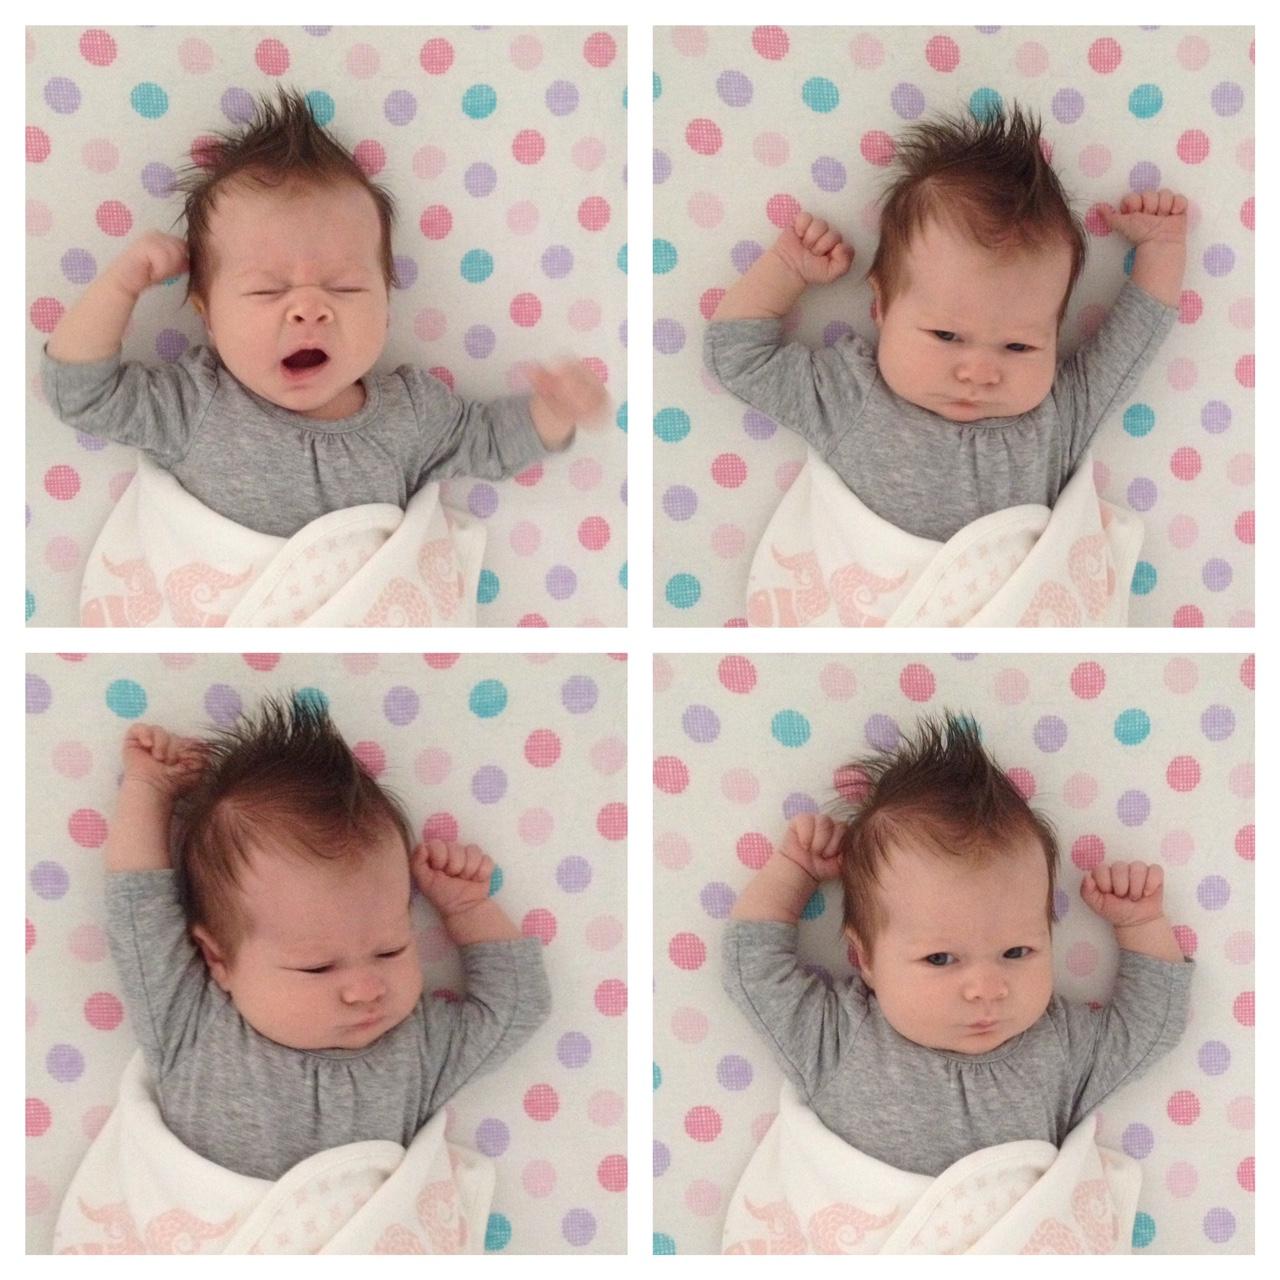 baby pandiculation